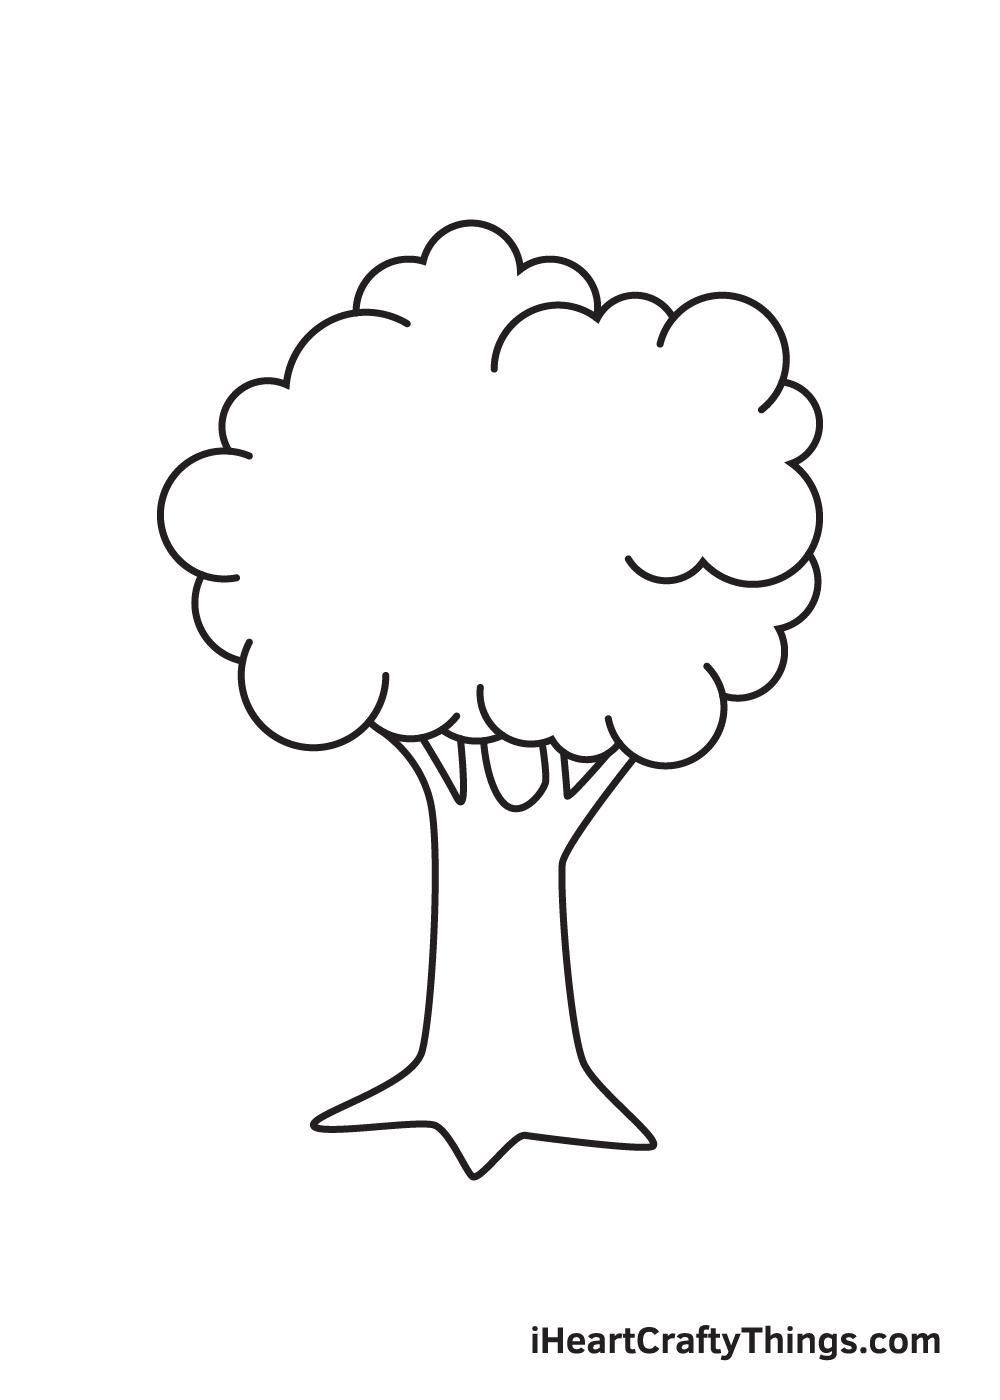 tree drawing step 9